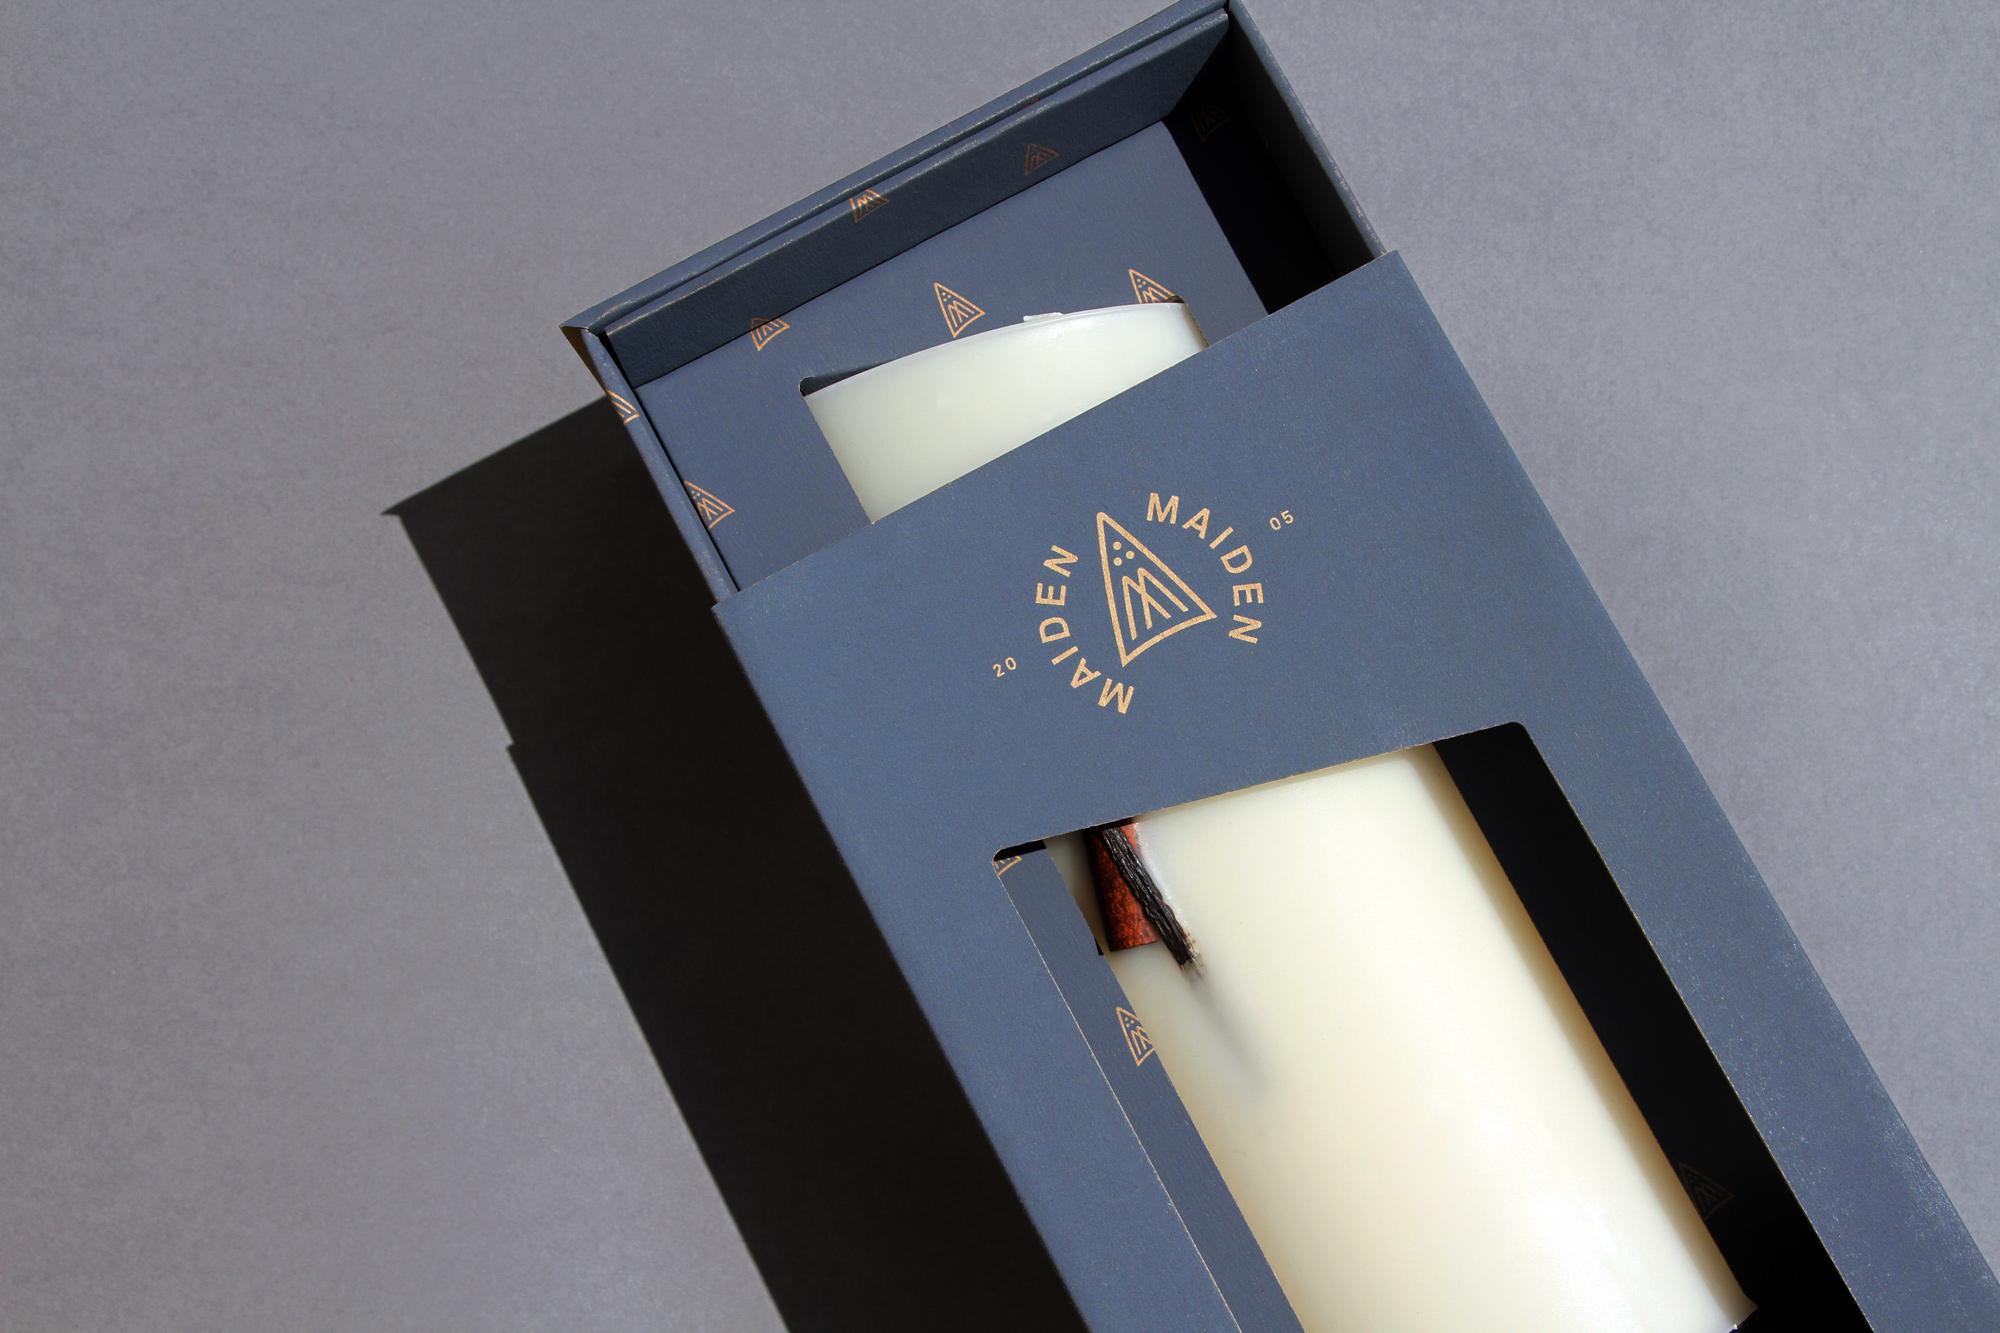 New Work — MAIDEN.BRANDING + PACKAGING.#brandingmob #logo #Brand #Branding #Design #Graphicdesign #Luxury #pattern #packagingdesign #packaging #British #NewRelease #Style #contemporary #handmade #london #dorset #graphicdesigner #graphicdesign #designagency #brandingagency #experience #candles #luxury #luxurydesign #luxurylifestyle